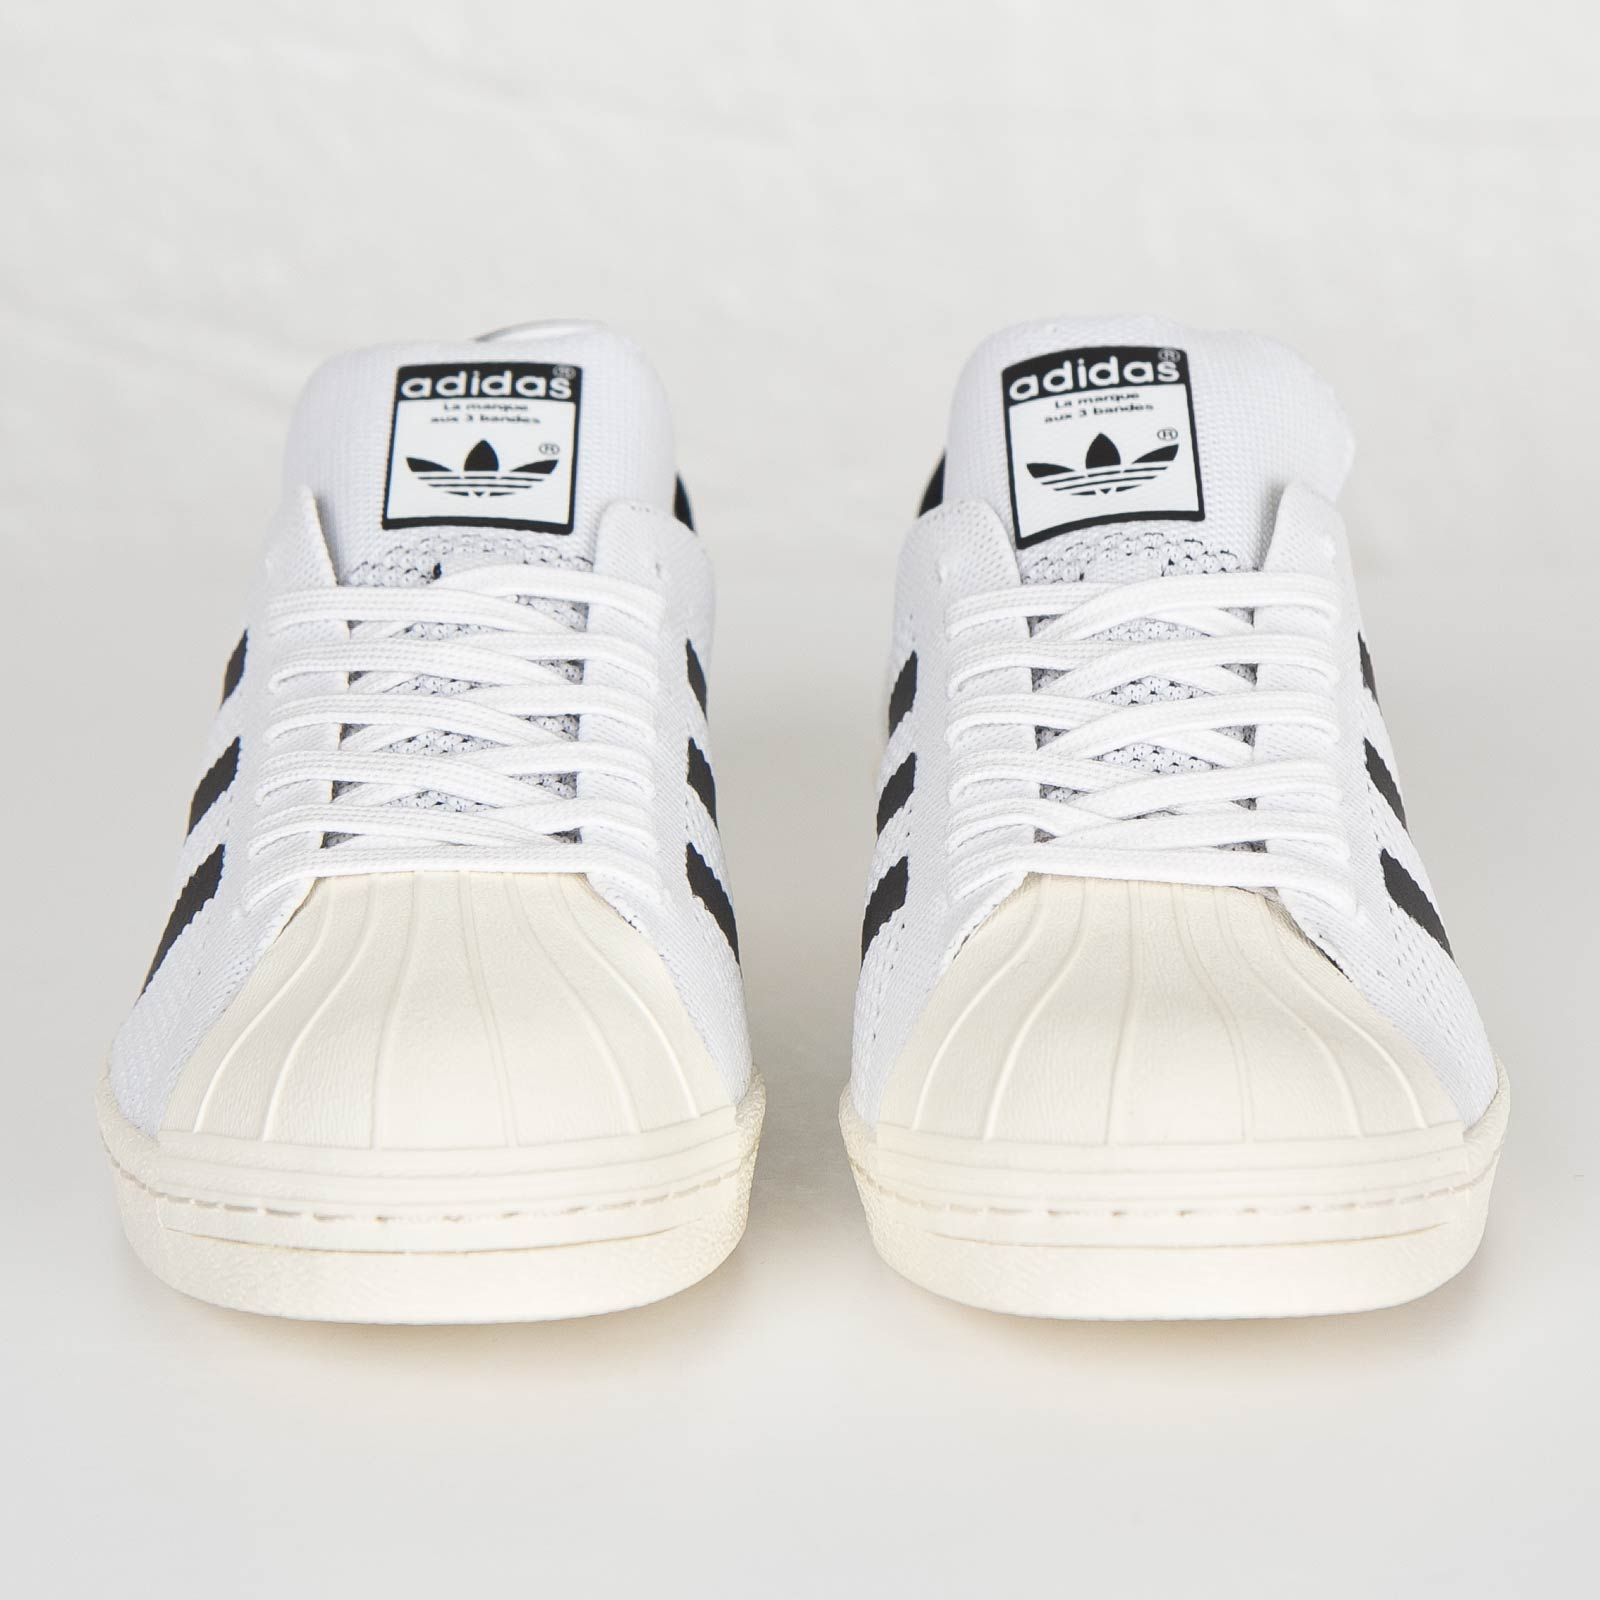 b11104dddd5 adidas Superstar 80s Primeknit adidas Superstar 80s Primeknit ...